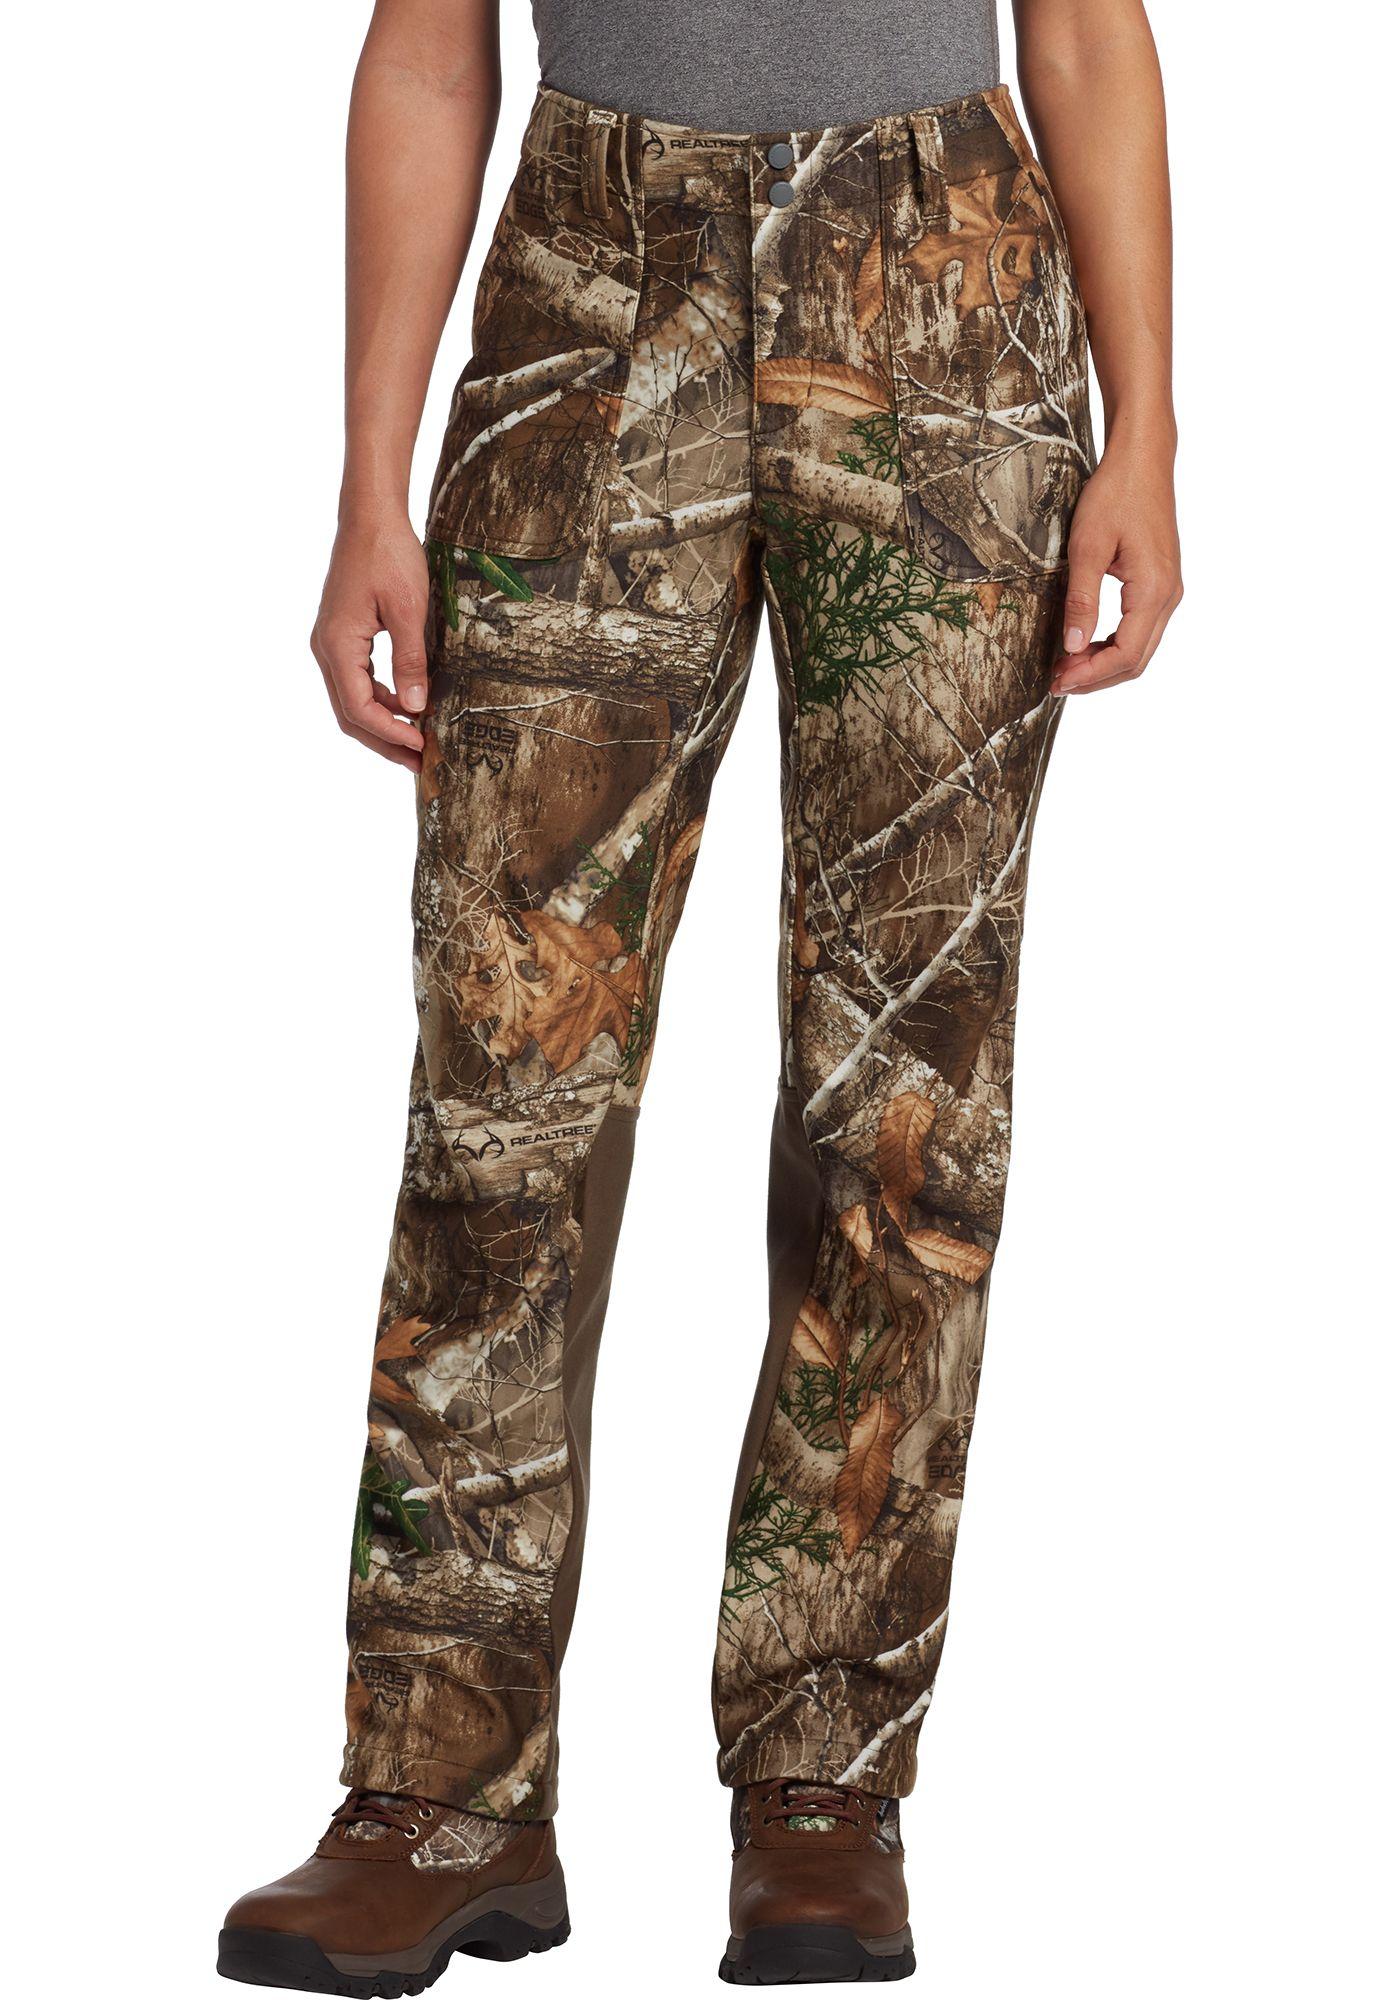 Field & Stream Women's Every Hunt Softshell Hunting Pants